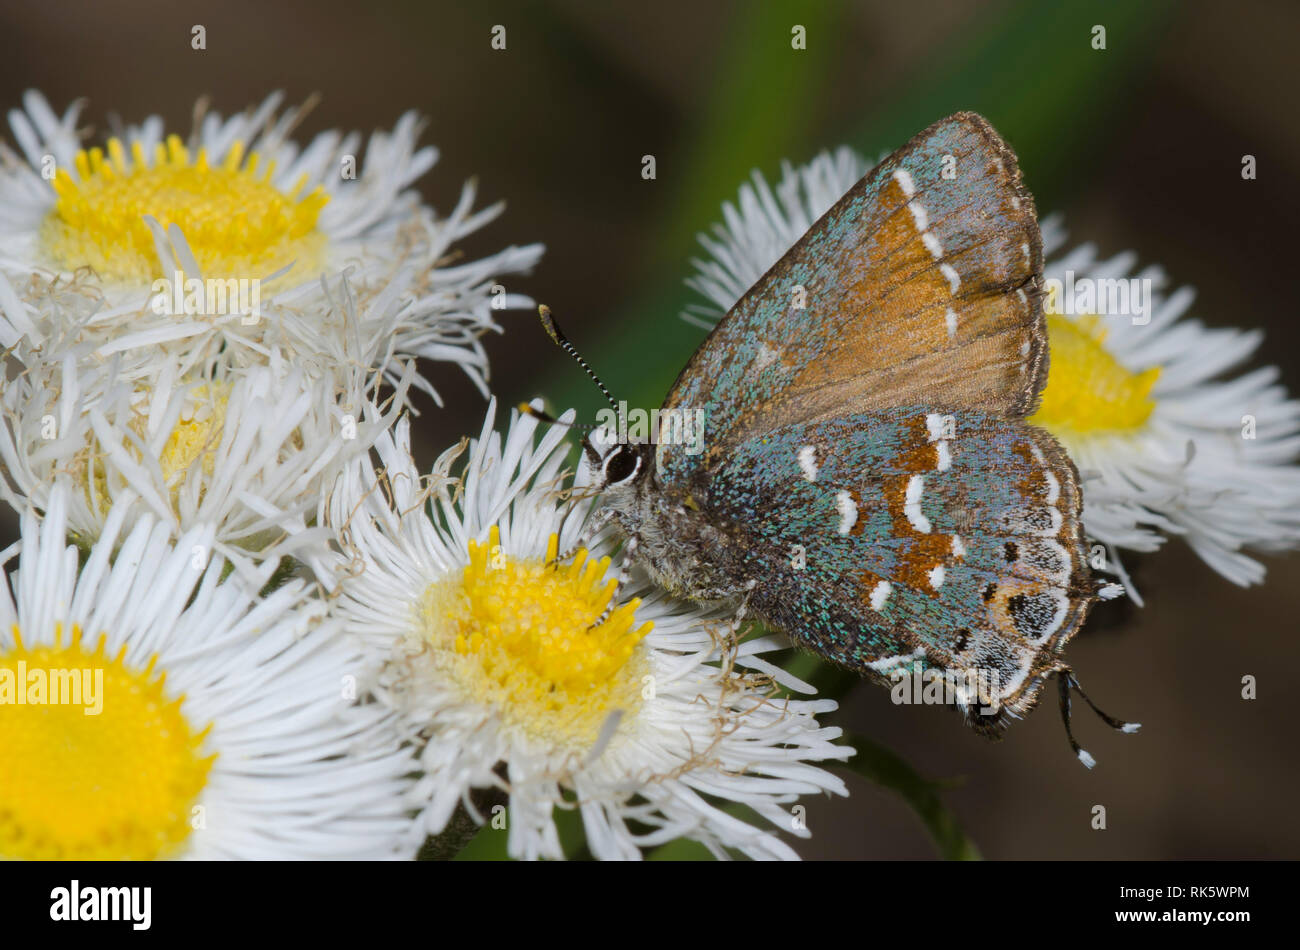 Juniper Hairstreak, Callophrys gryneus, nectaring from fleabane, Erigeron sp. Stock Photo